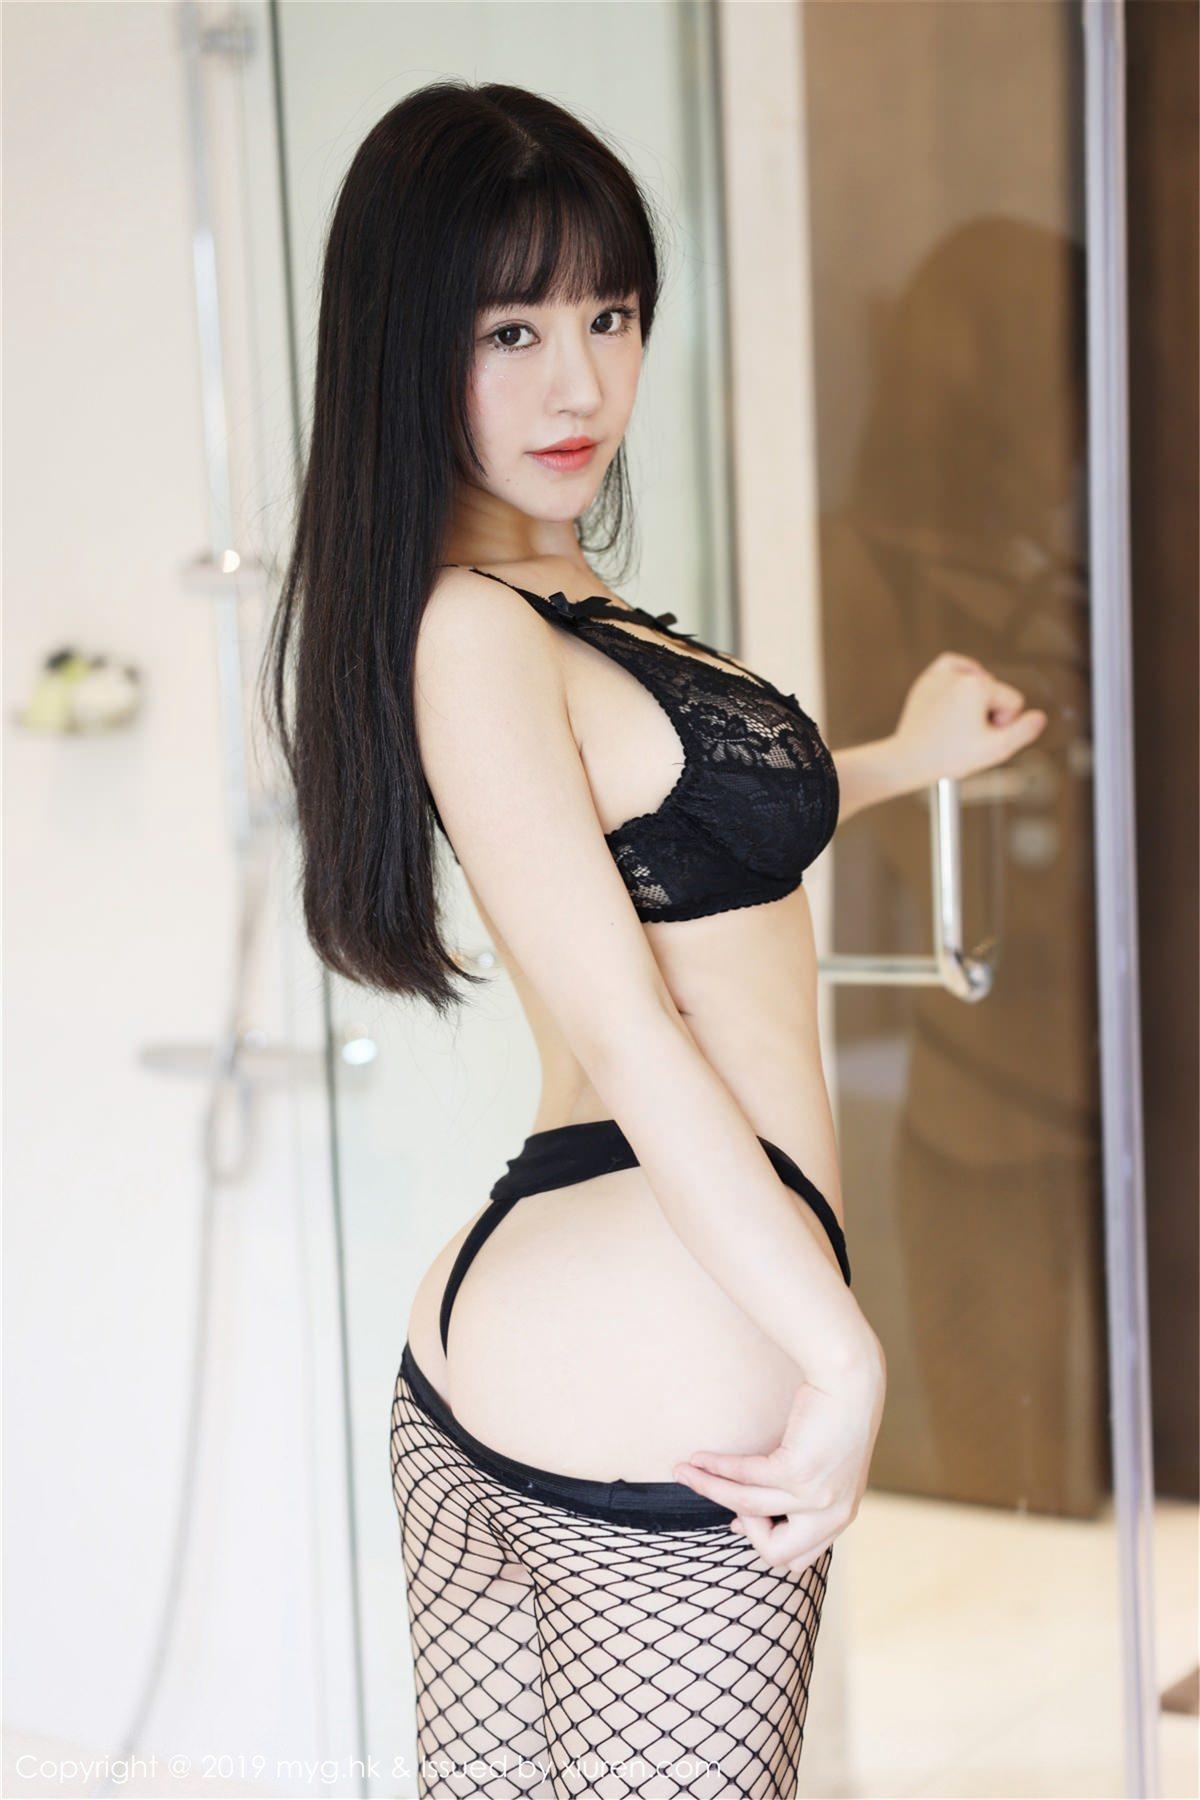 MyGirl Vol.357 82P, mygirl, Zhu Ke Er